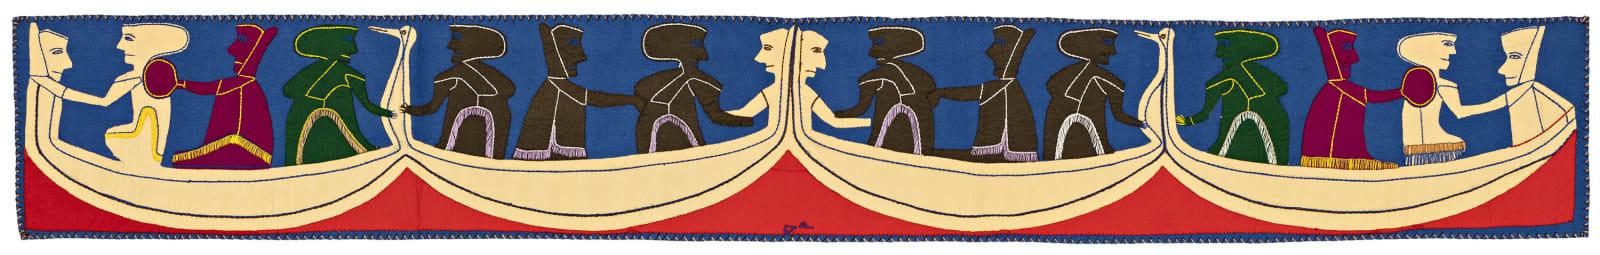 Lot 19 JESSIE OONARK, O.C., R.C.A (1906-1985) QAMANI'TUAQ (BAKER LAKE) Untitled Wall Hanging, 1974 stroud, felt, and embroidery floss, 10.5 x 72 in (26.7 x 182.9 cm) Estimate: $25,000 — $35,000